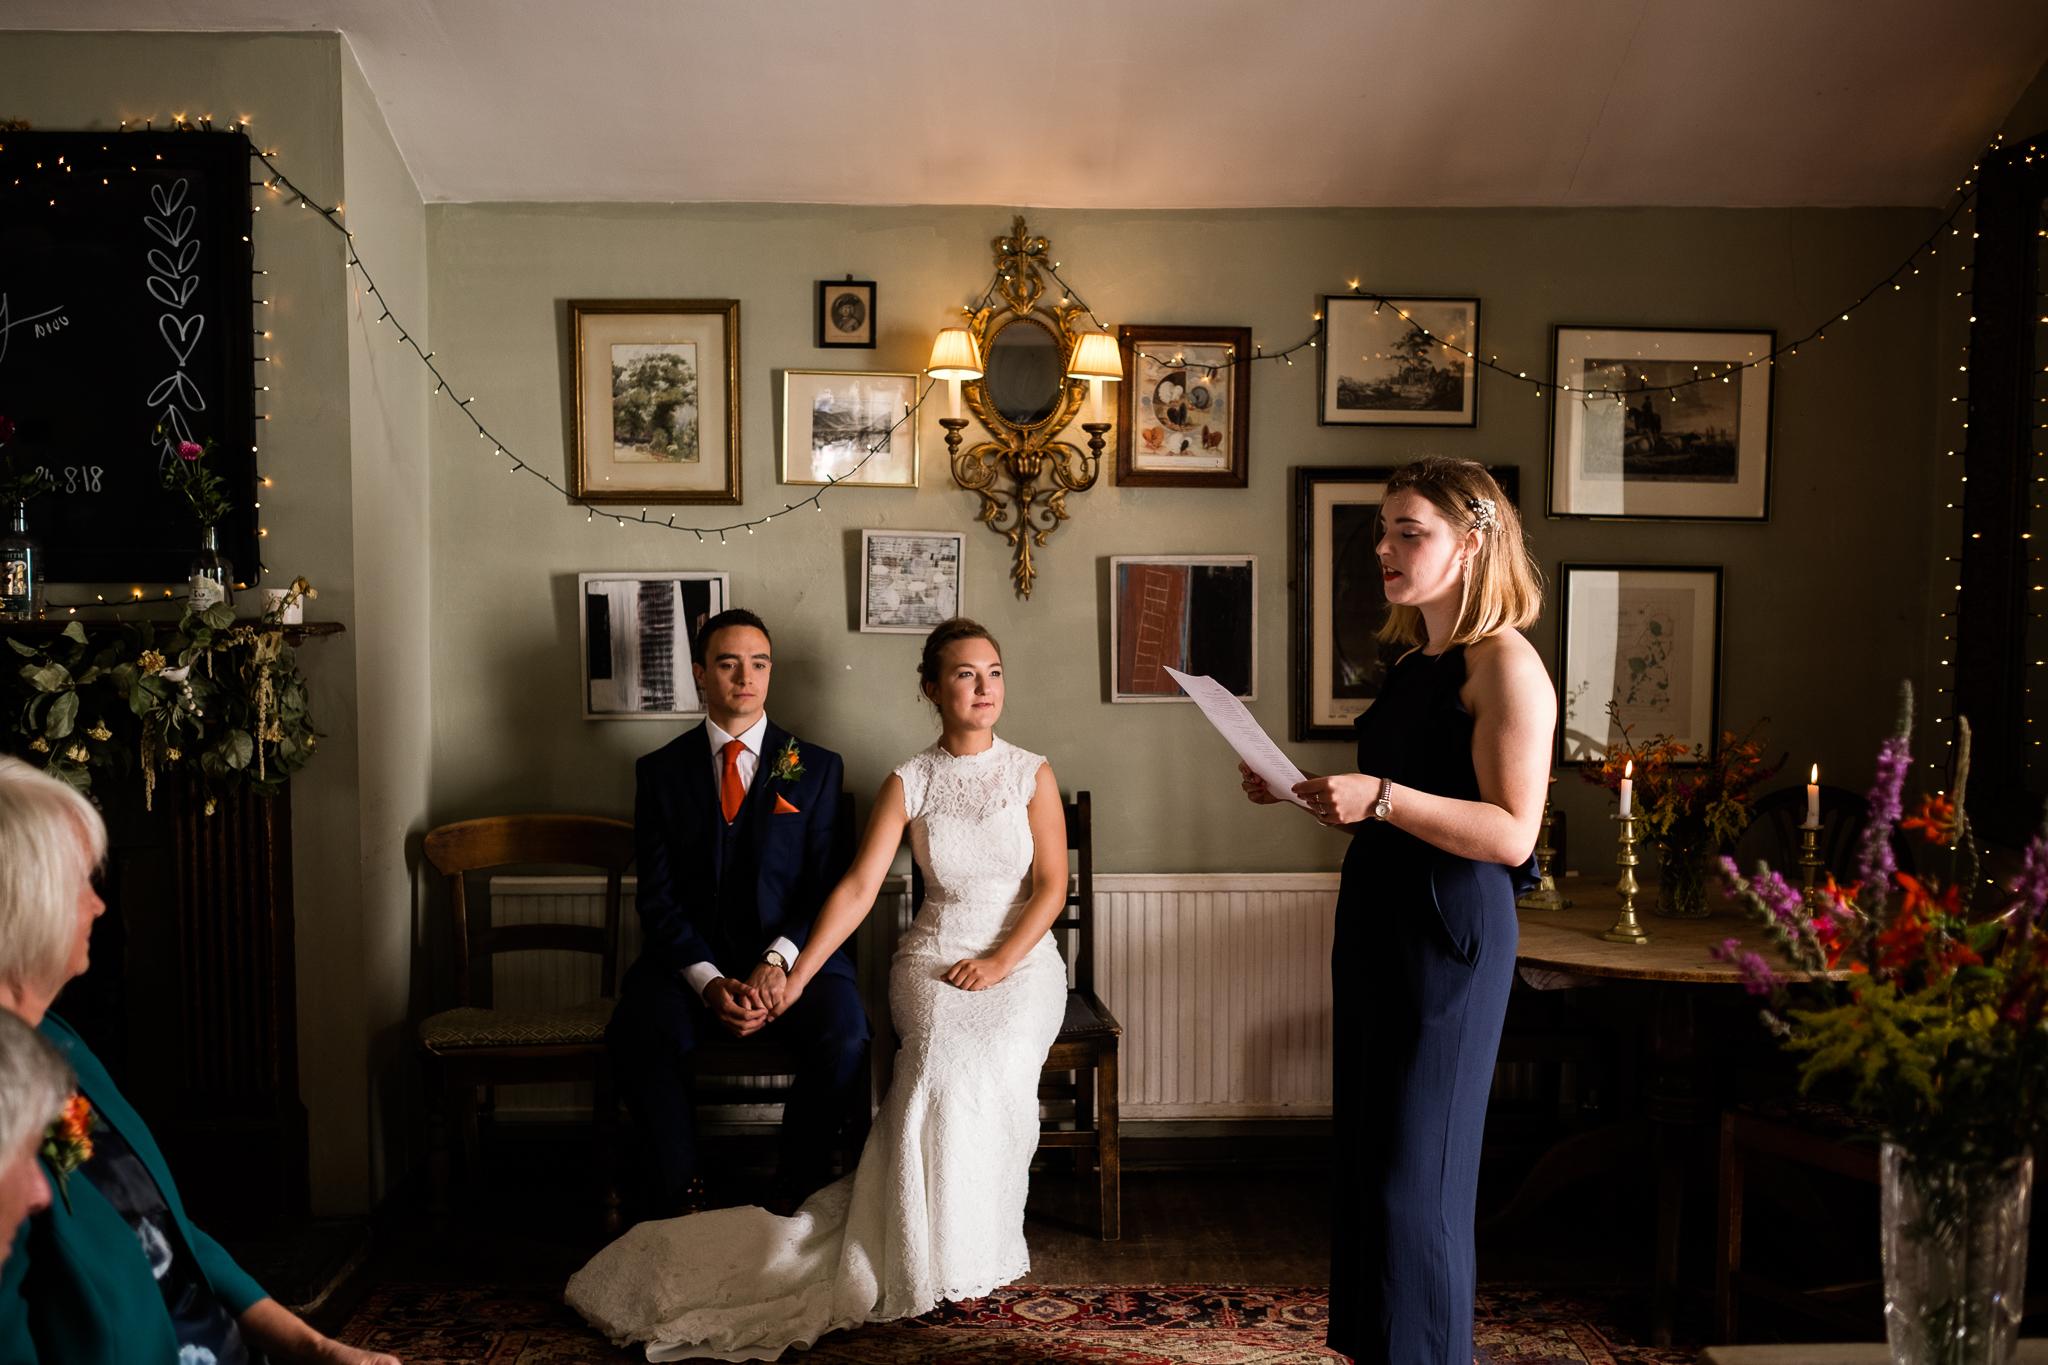 Relaxed Documentary Wedding Photography at The Wizard Inn, Alderley Edge Cheshire - Jenny Harper-29.jpg